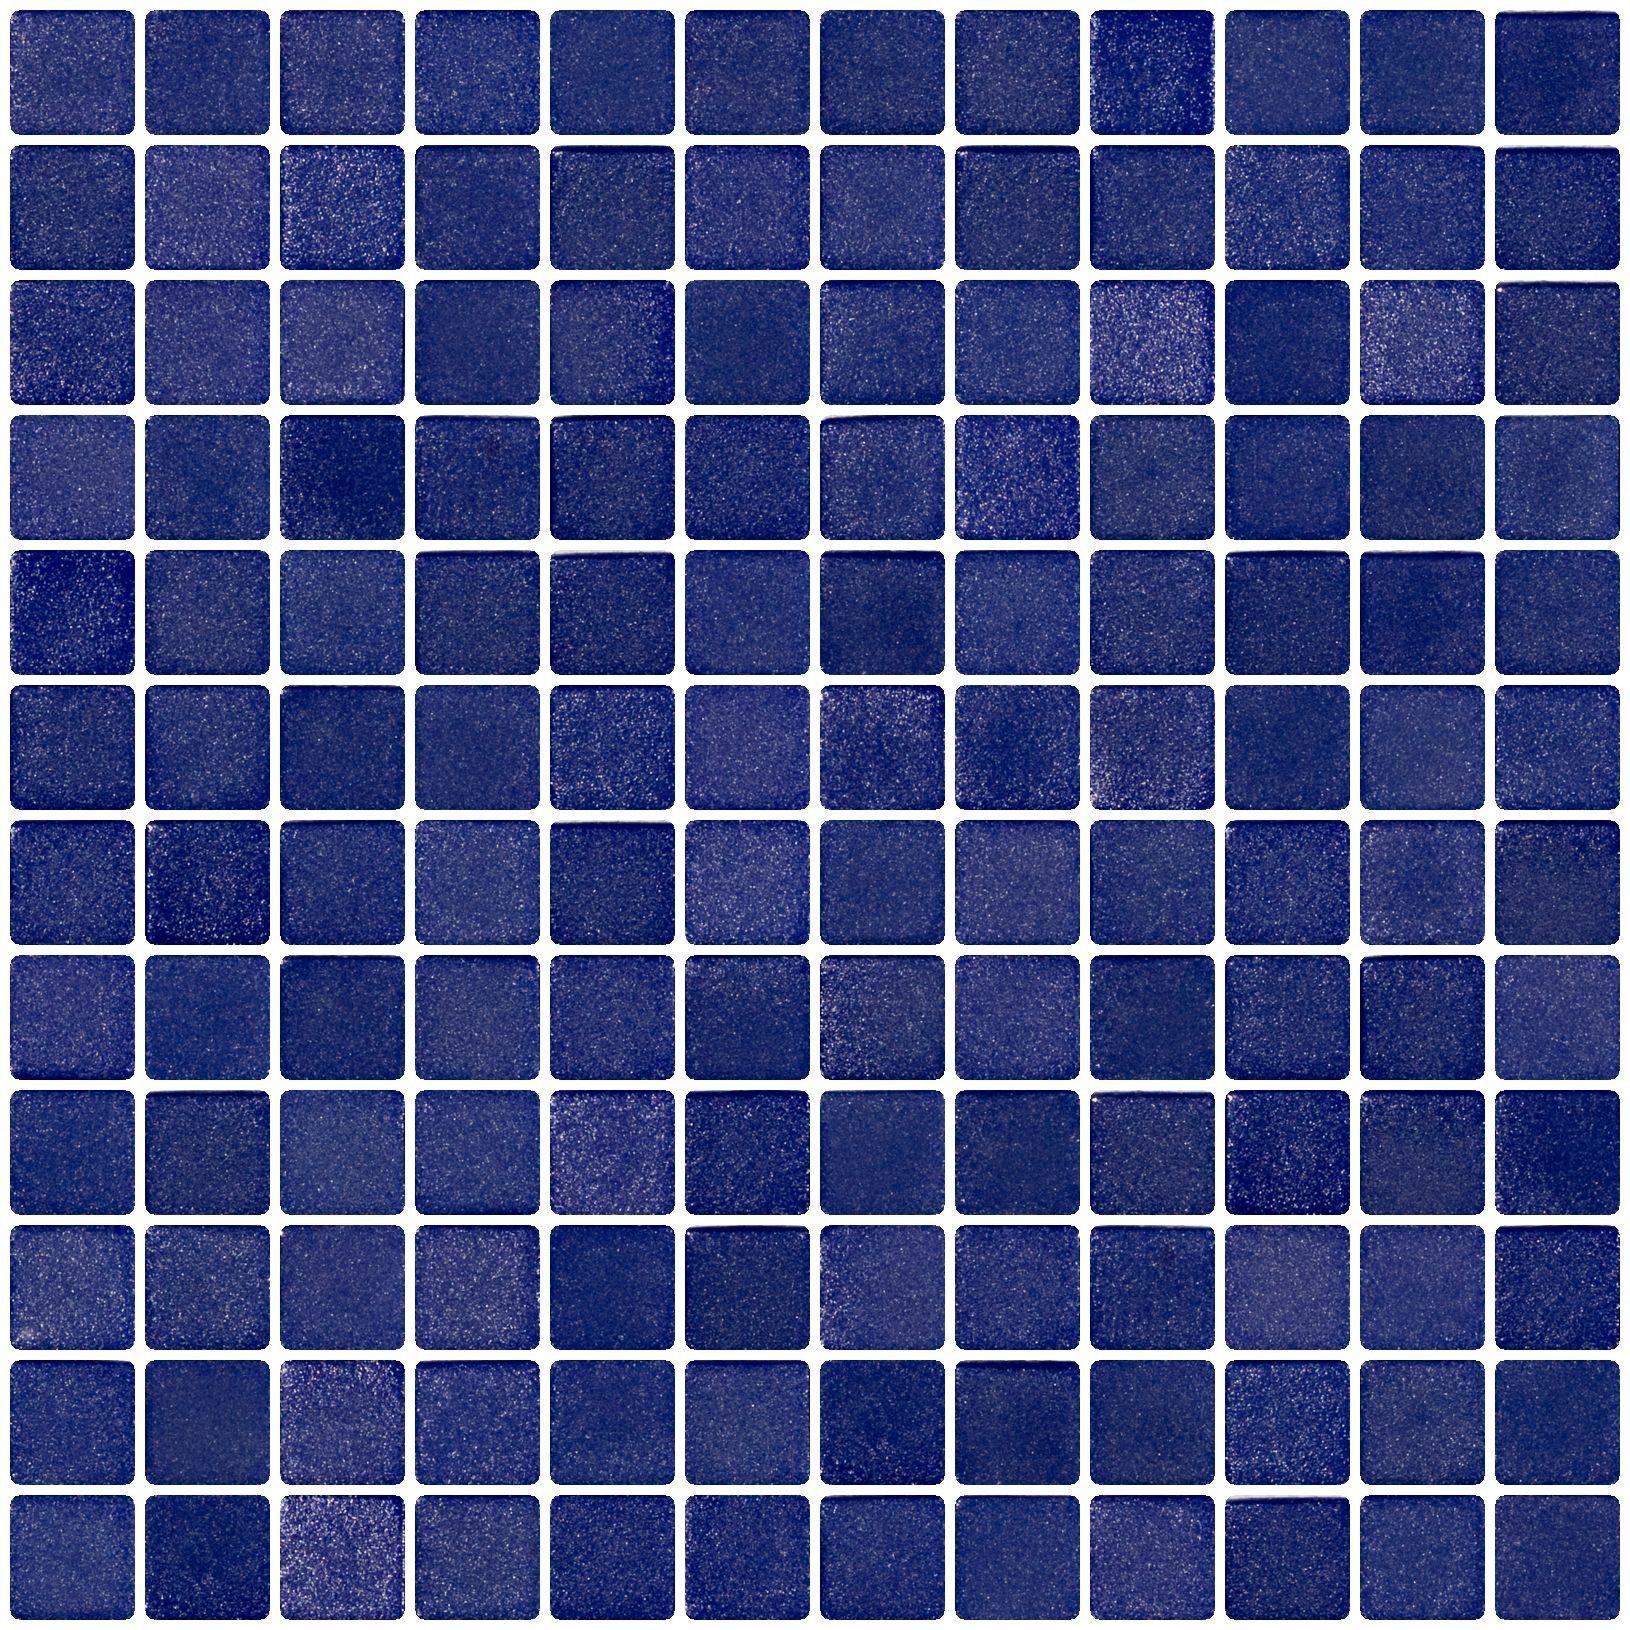 1 Inch Cobalt Blue Textured Anti-slip Glass Tile | bathrooms ...